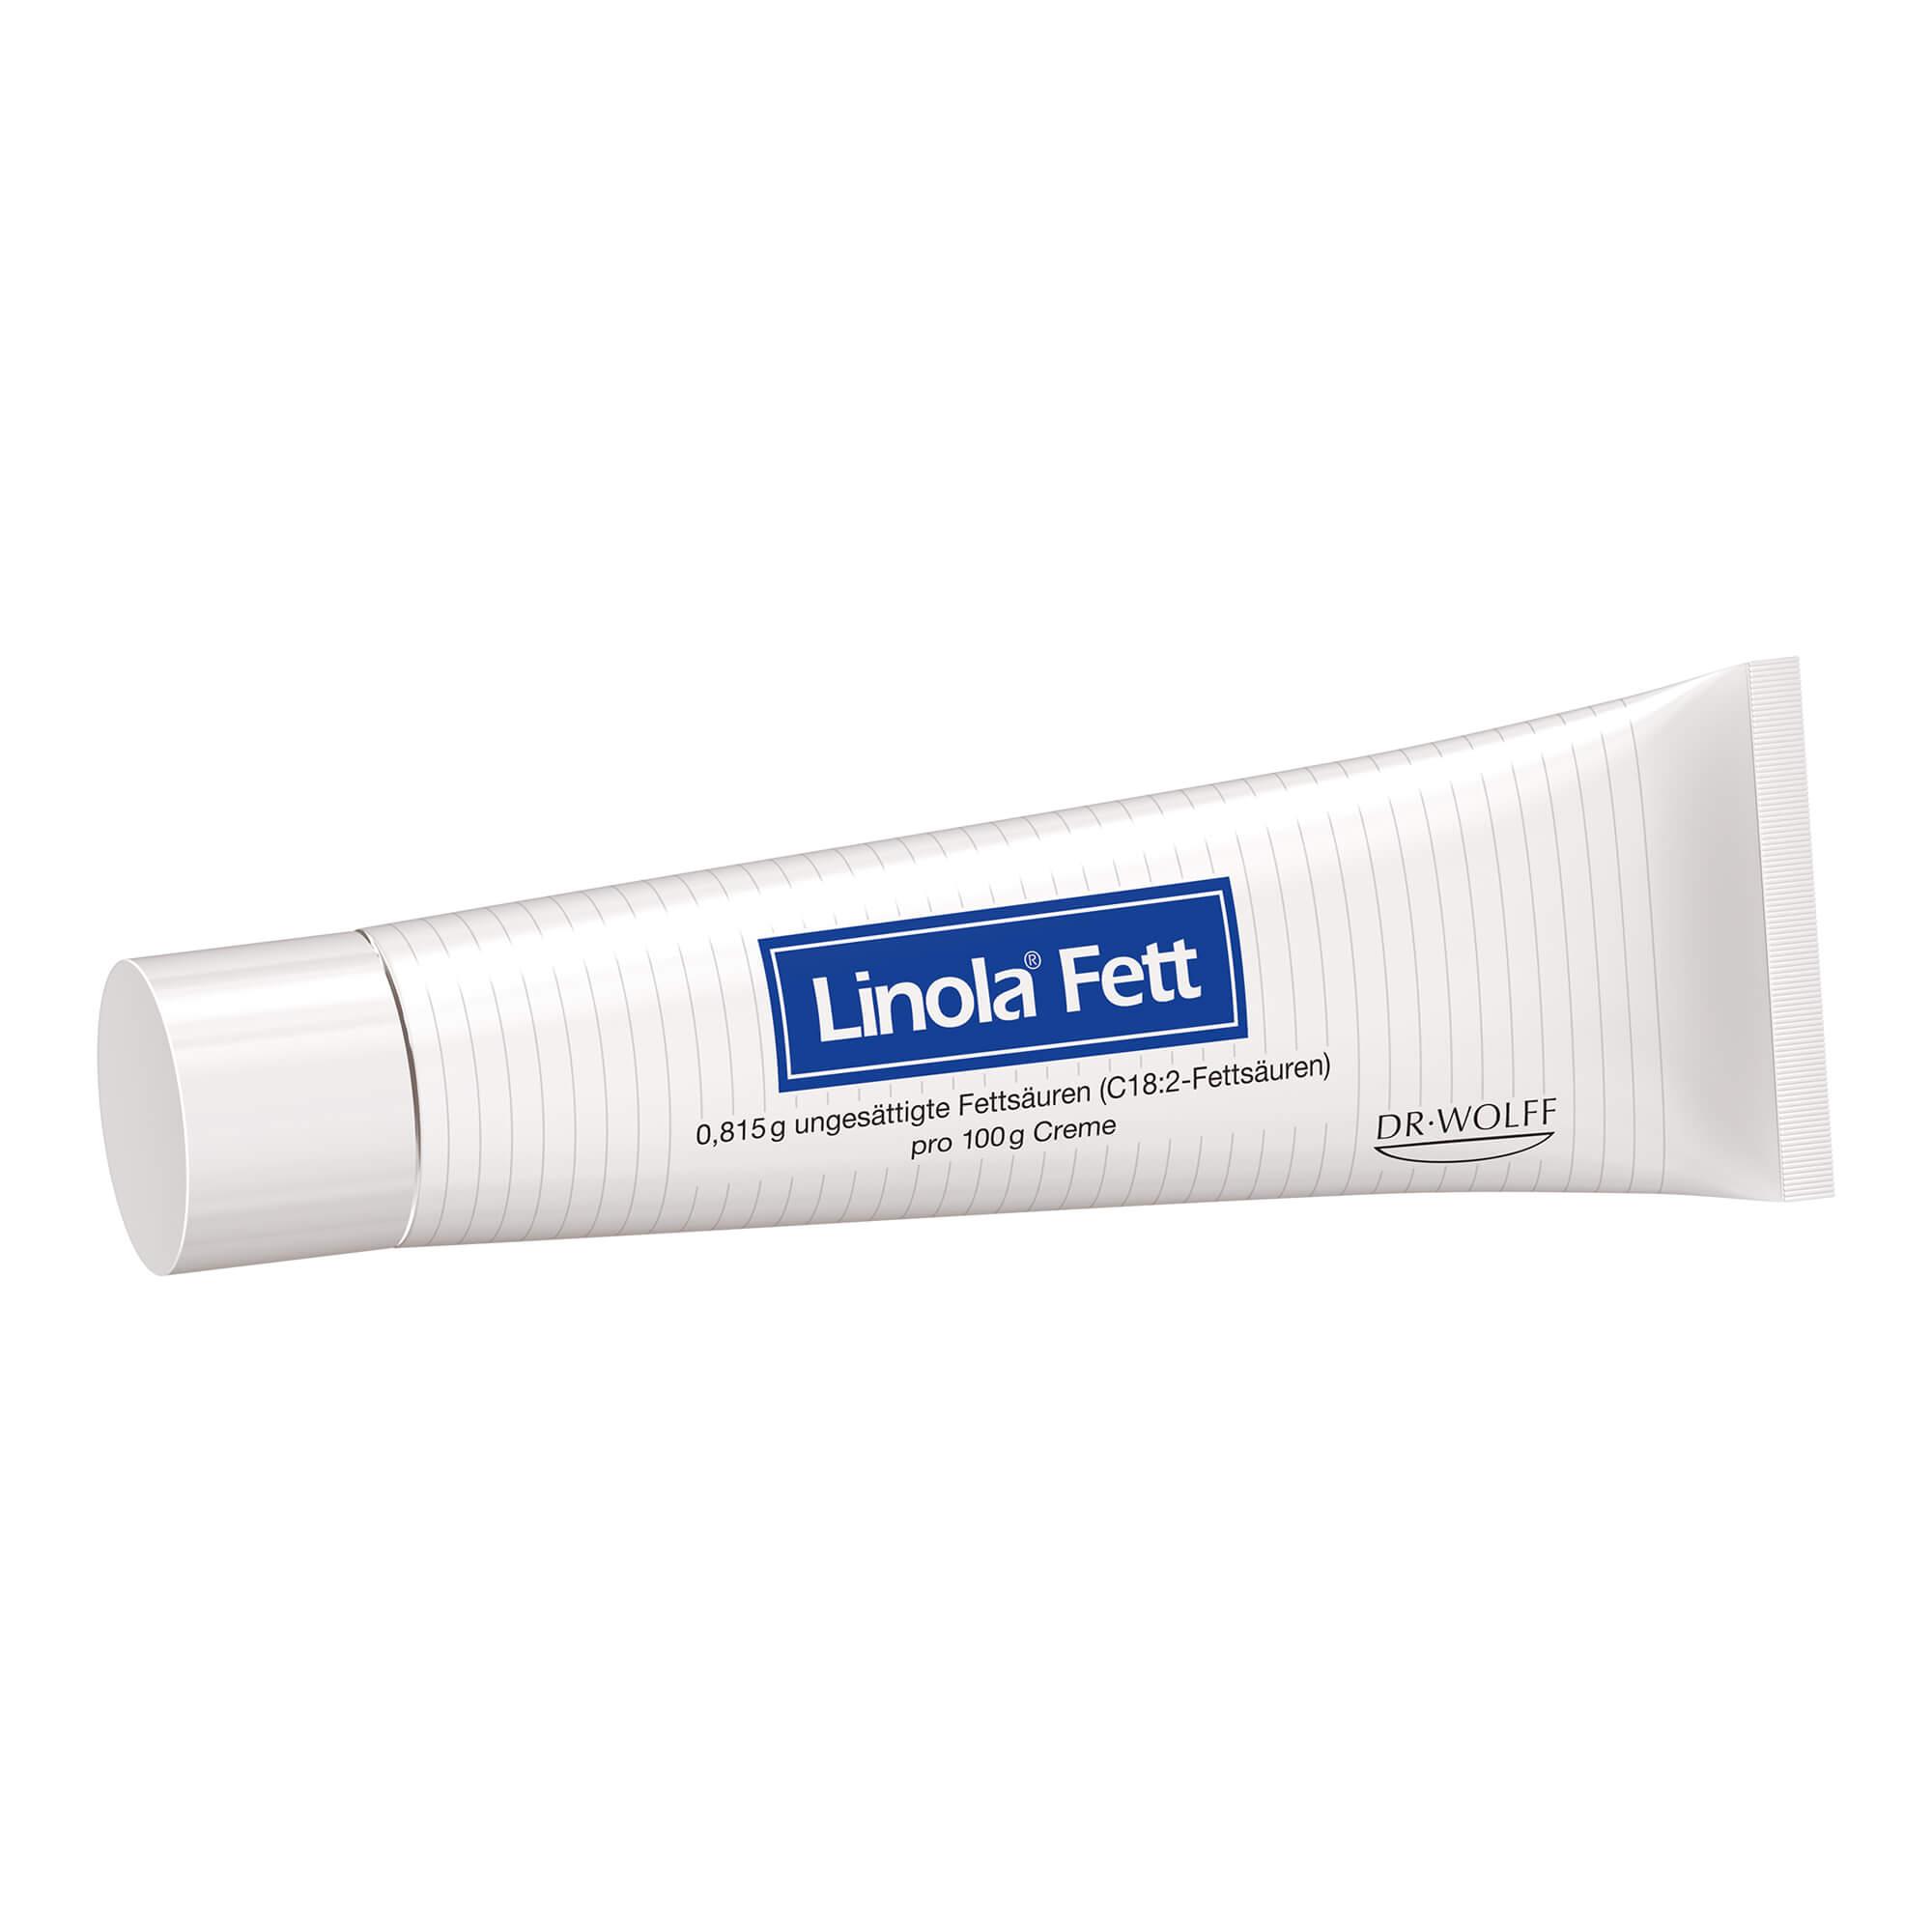 Linola Fett Creme